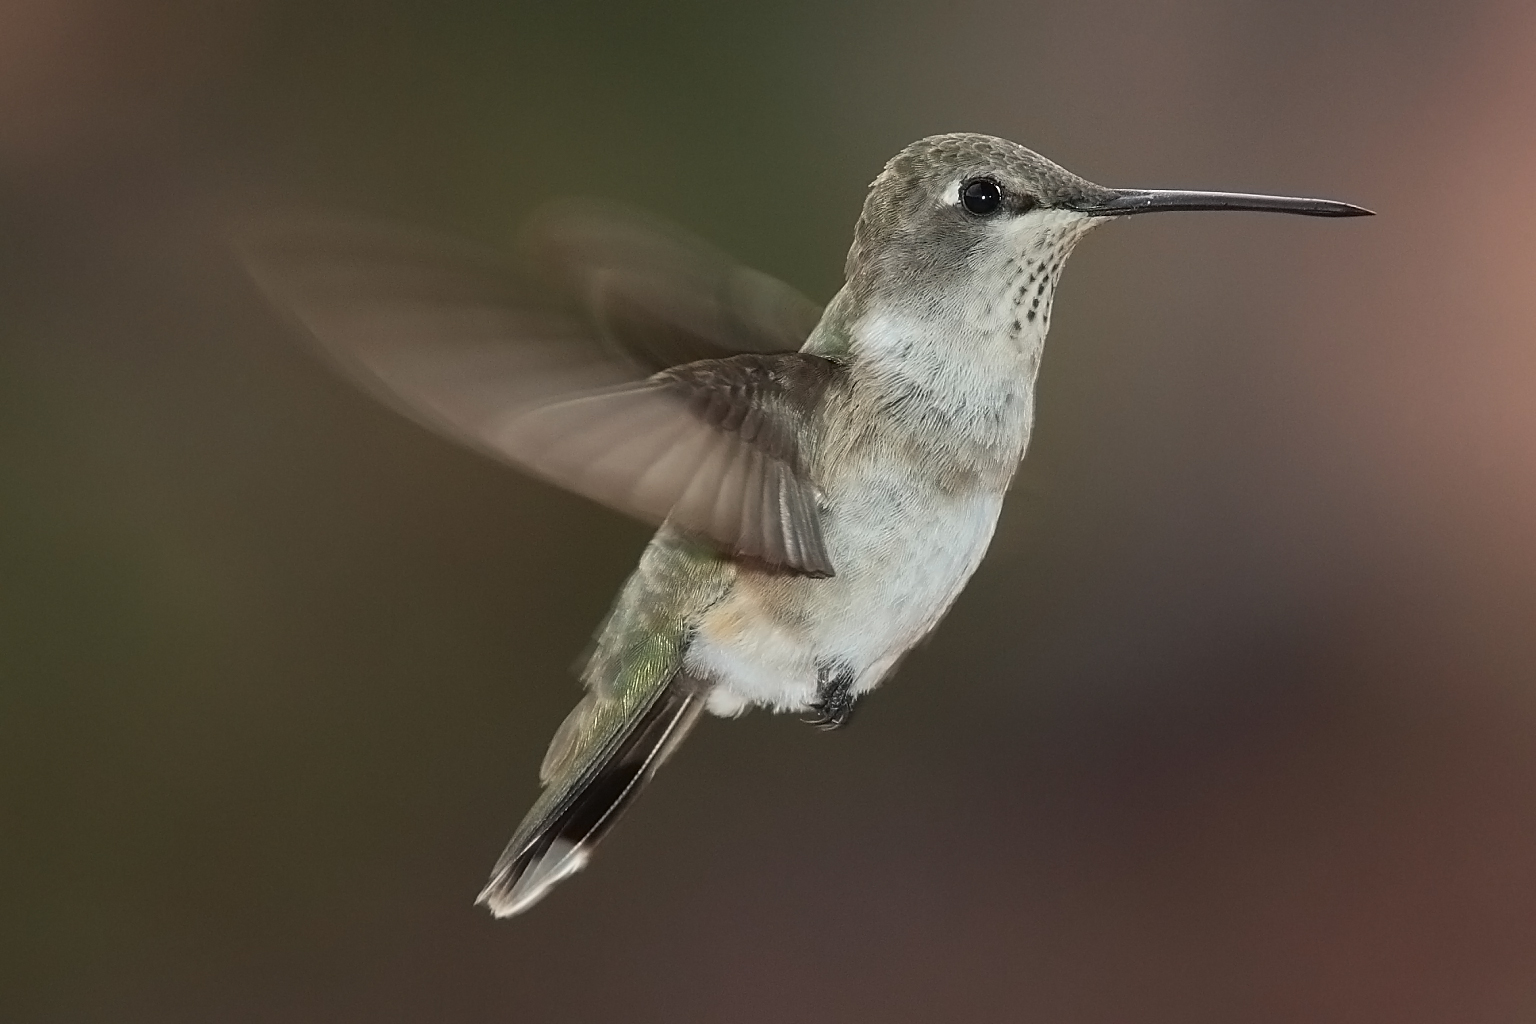 1536x1024 > Hummingbird Wallpapers